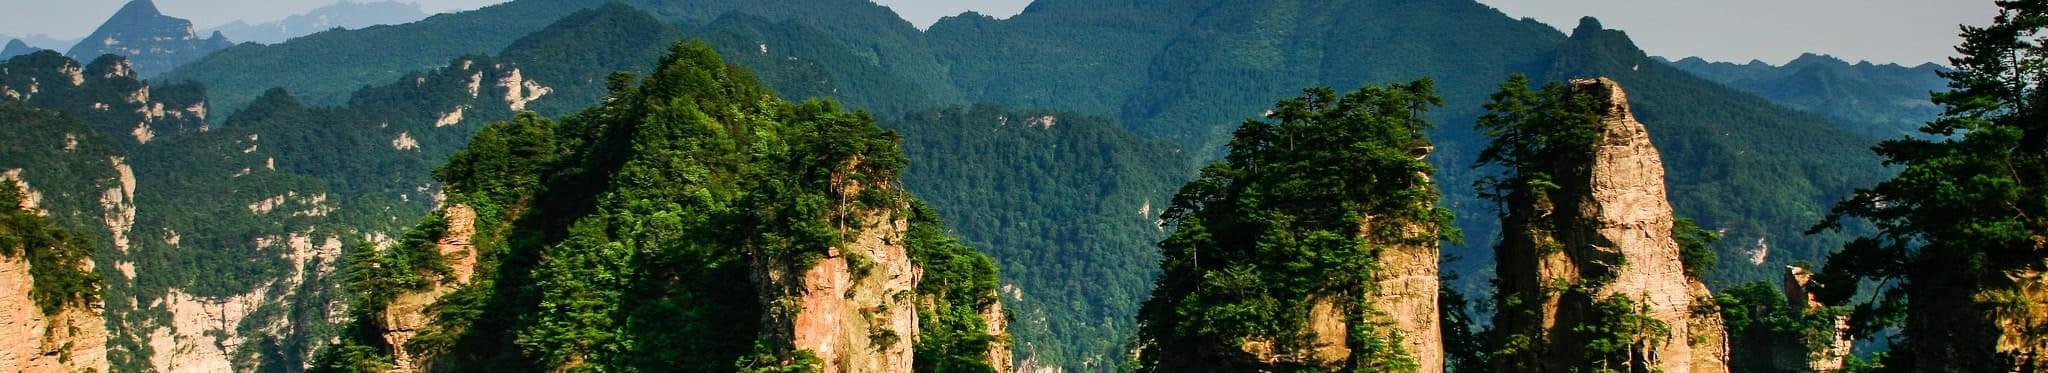 Легенда Желтого дракона <br> Пекин — Сиань — Чжанцзяцзе — Шанхай